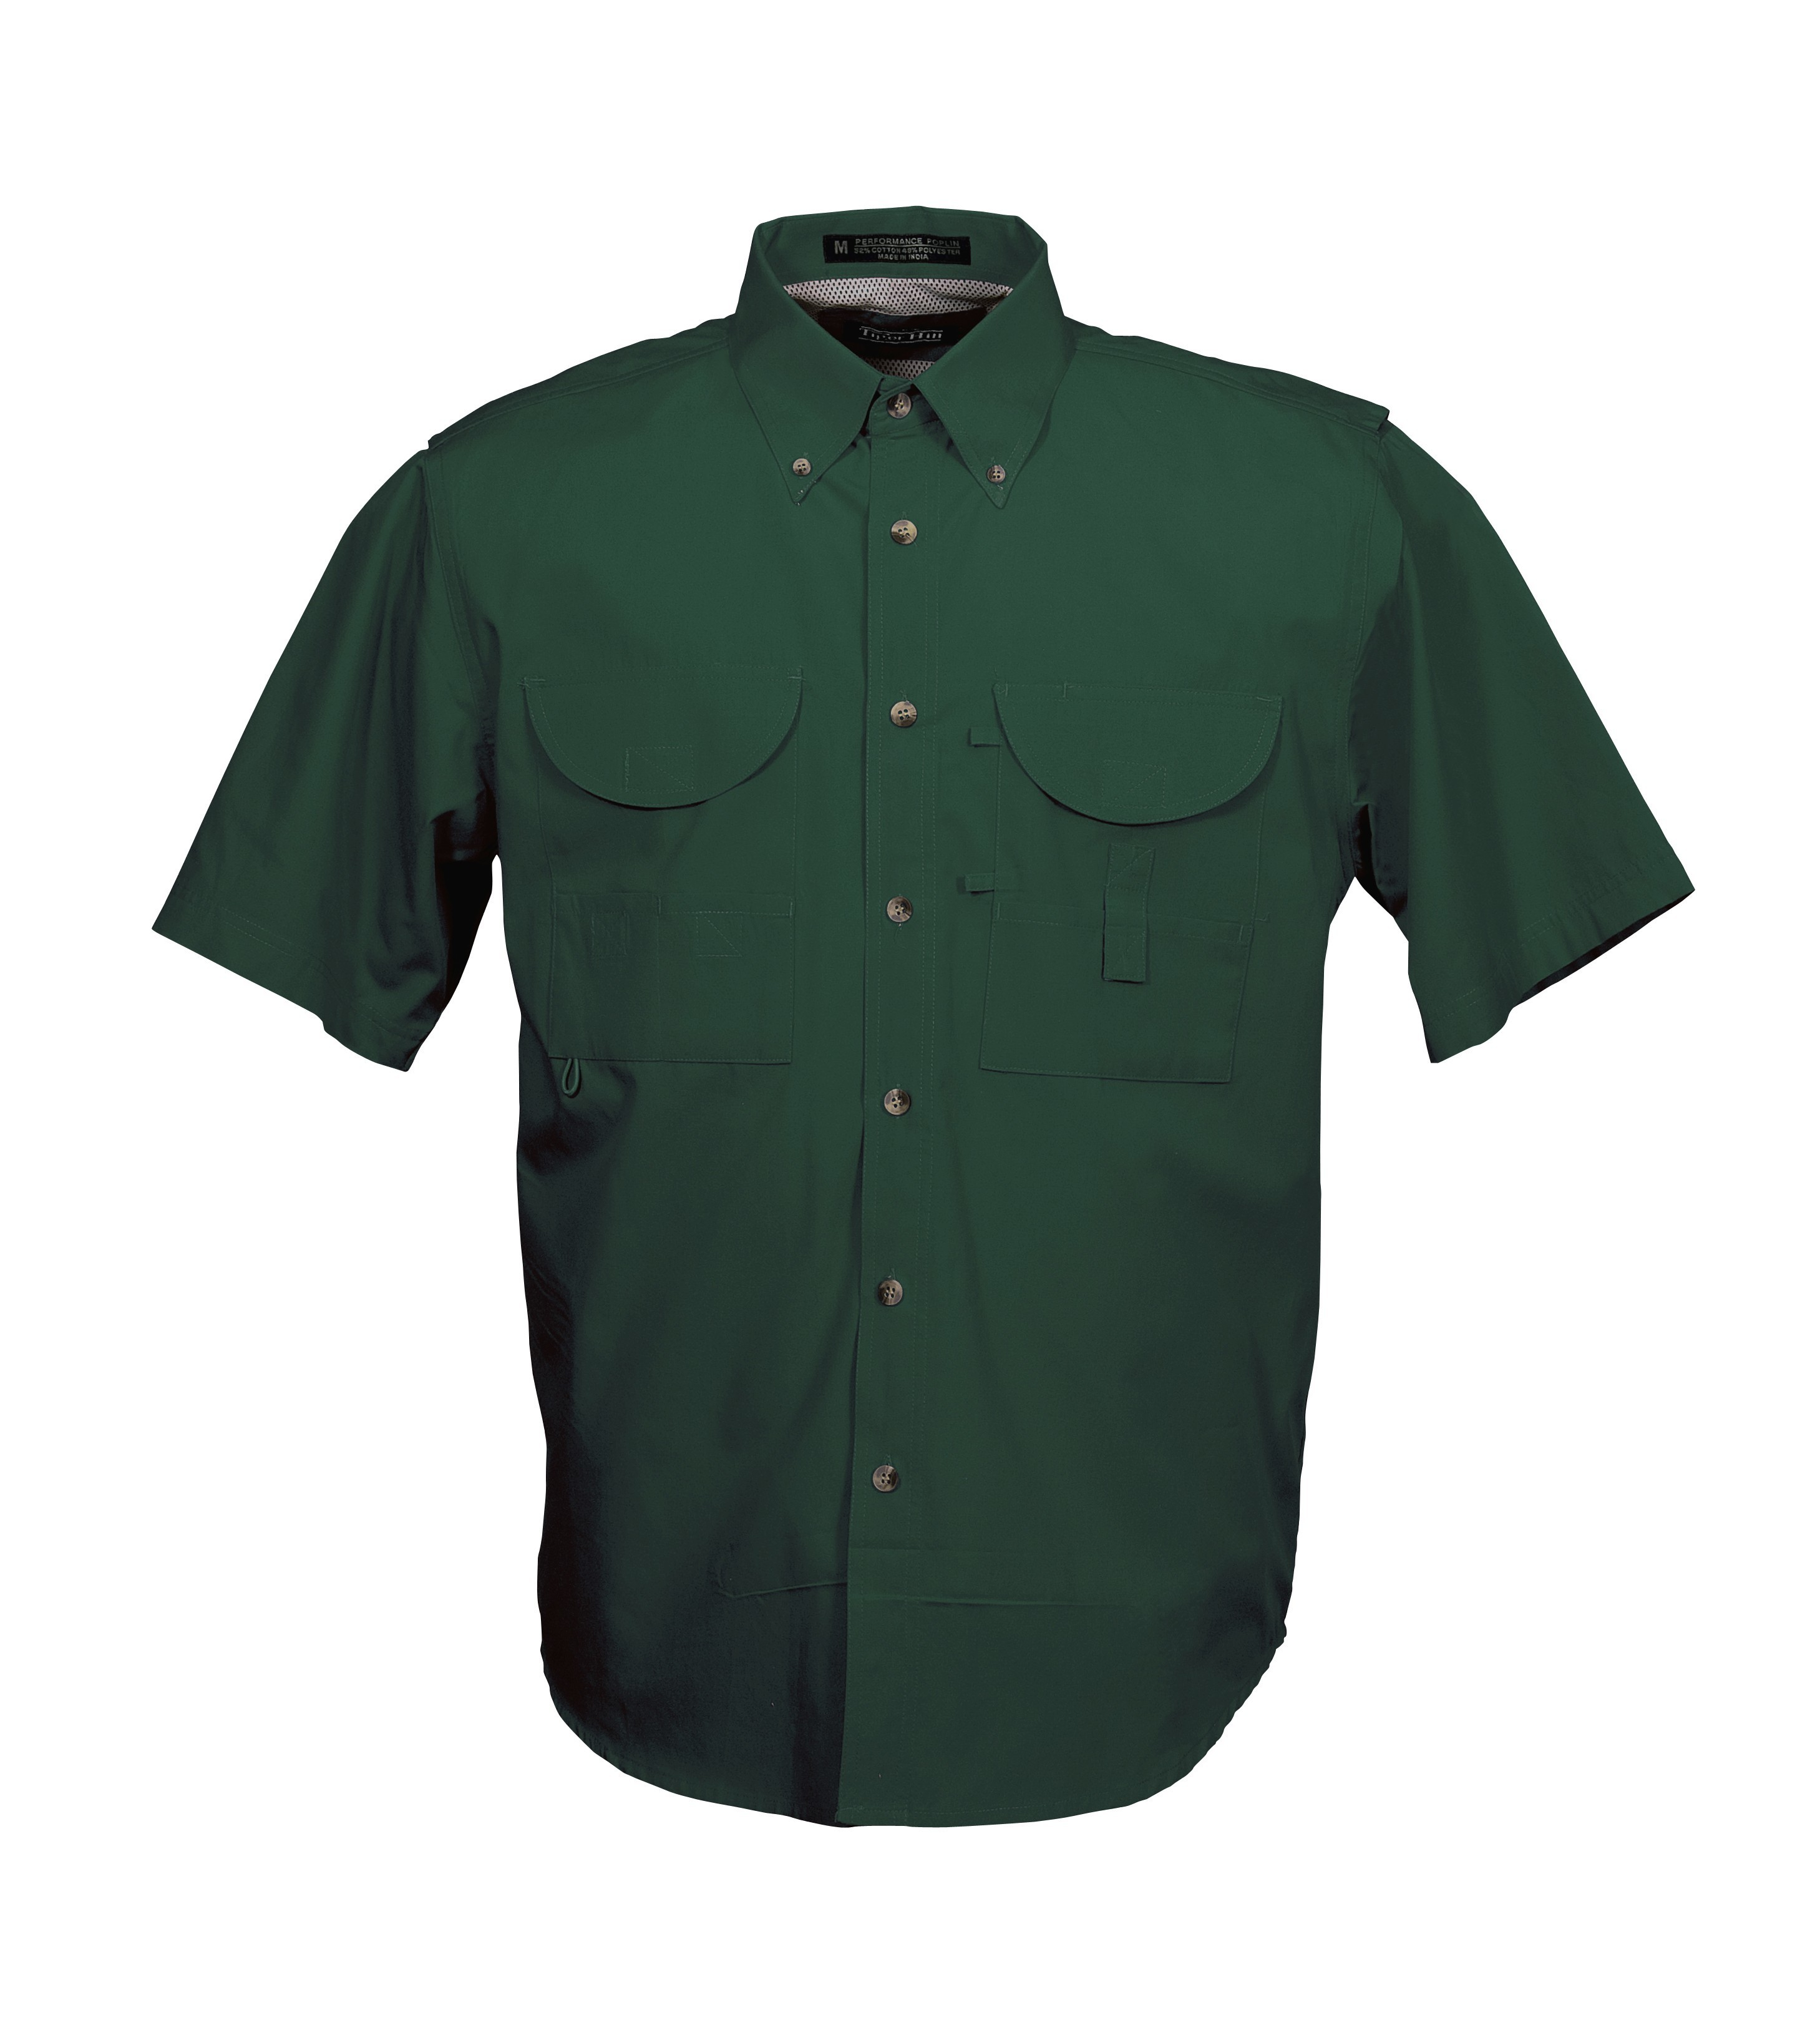 Tiger hill men 39 s fishing shirt short sleeves forest green for Men s fishing apparel